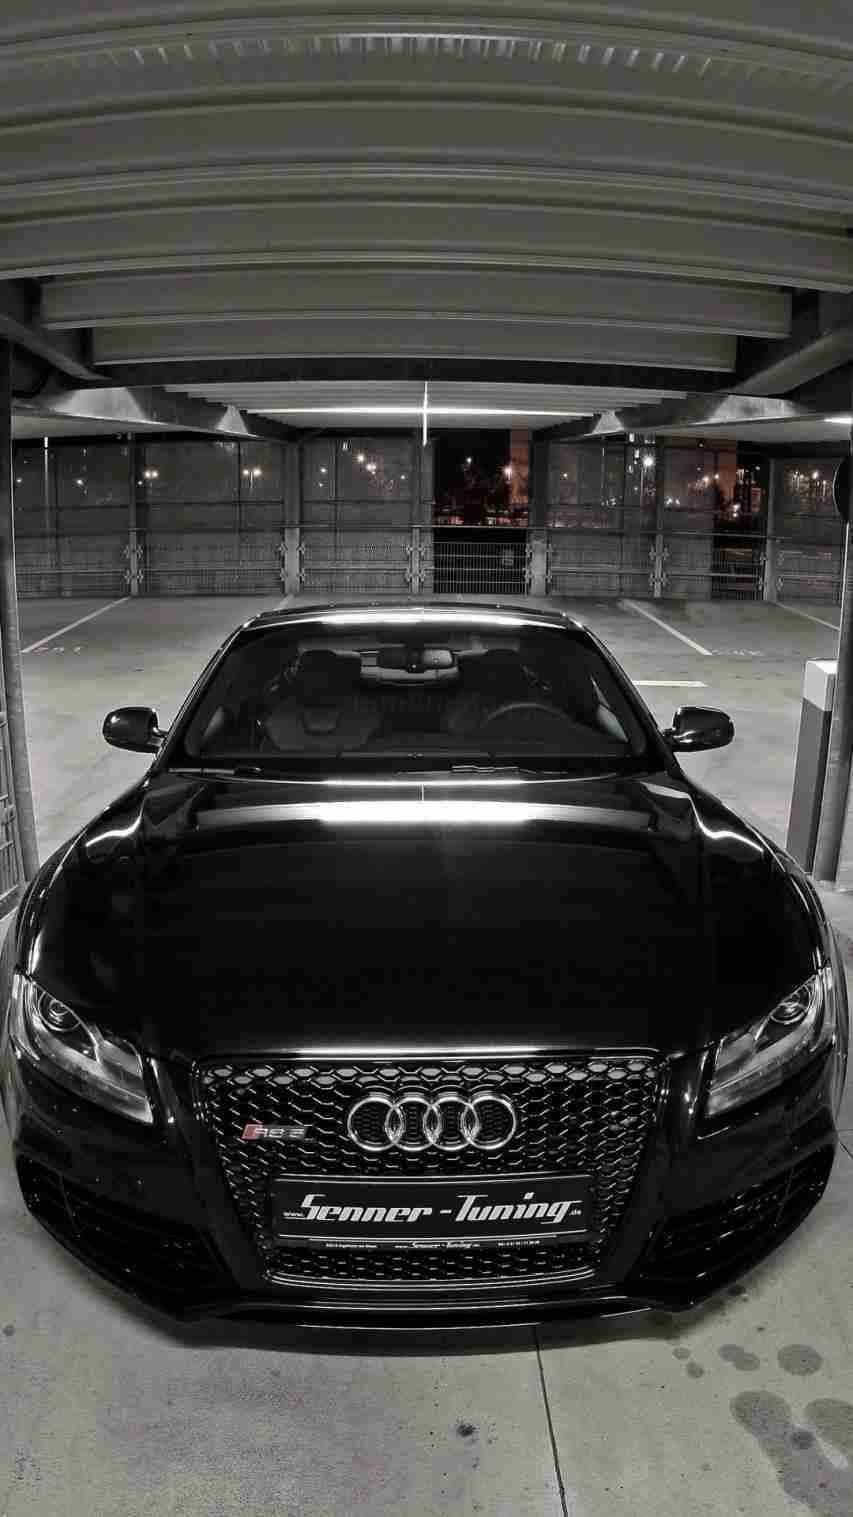 Audi R8 Black Matte Wallpaper 208 Audi R8 Gt2 Wallpapers Hd Wallpapers Audi R8 Wallpaper Audi R8 Cars Matte Co Best Car Insurance Luxury Cars Black Audi